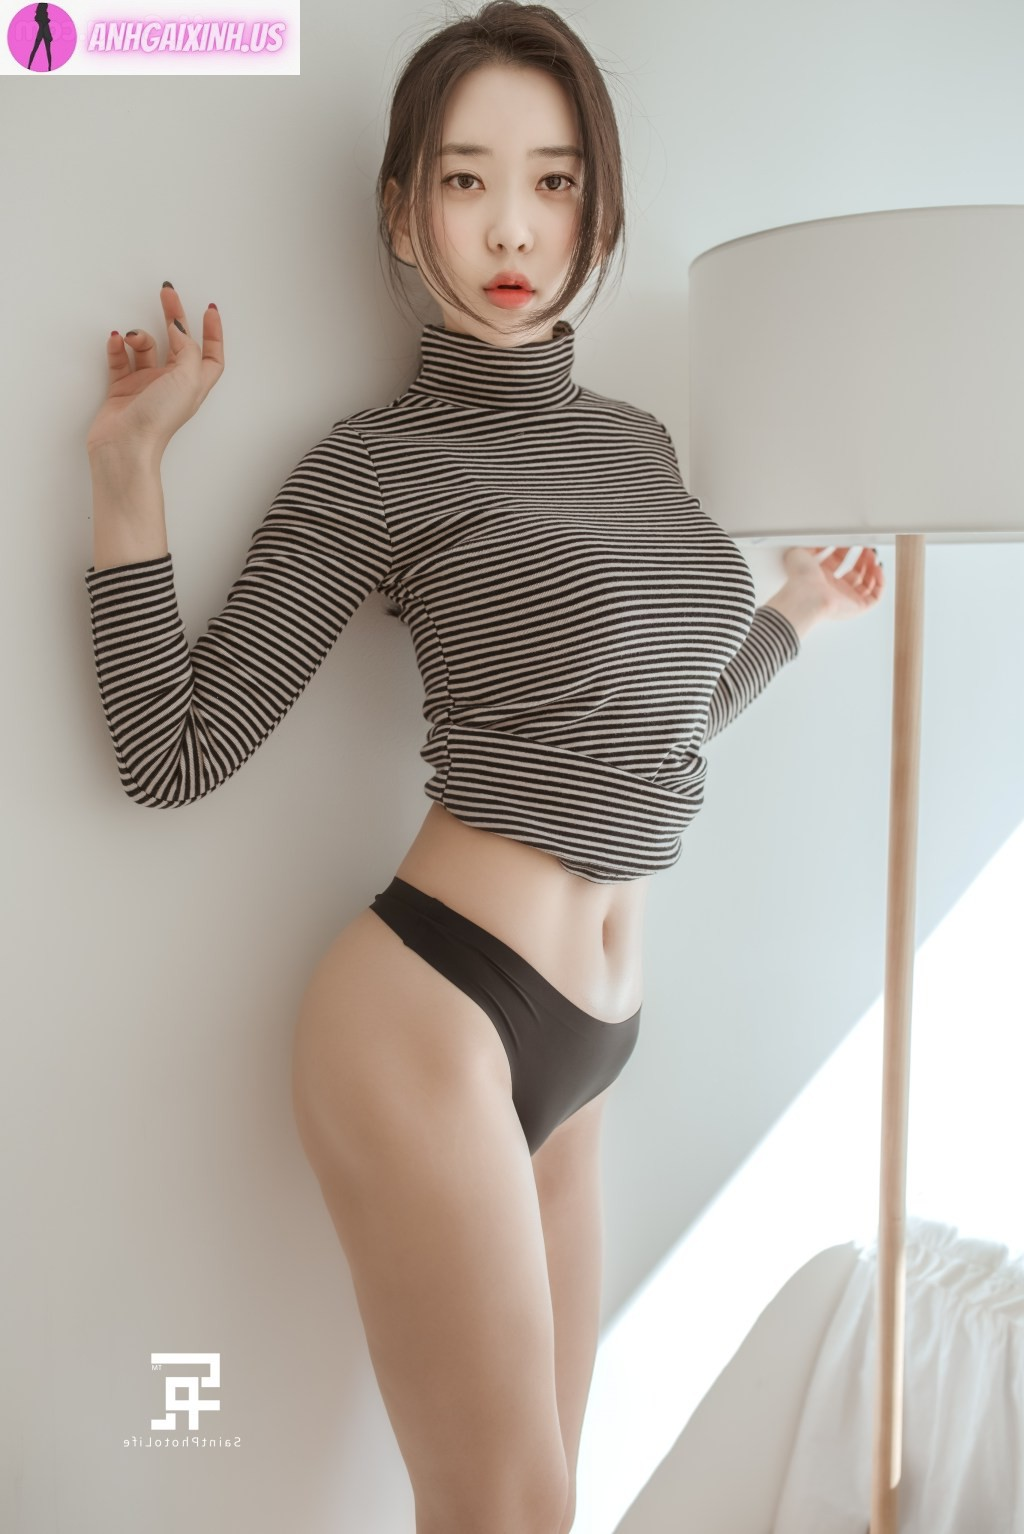 Ảnh Hot Girl Đáng Yêu Bikini